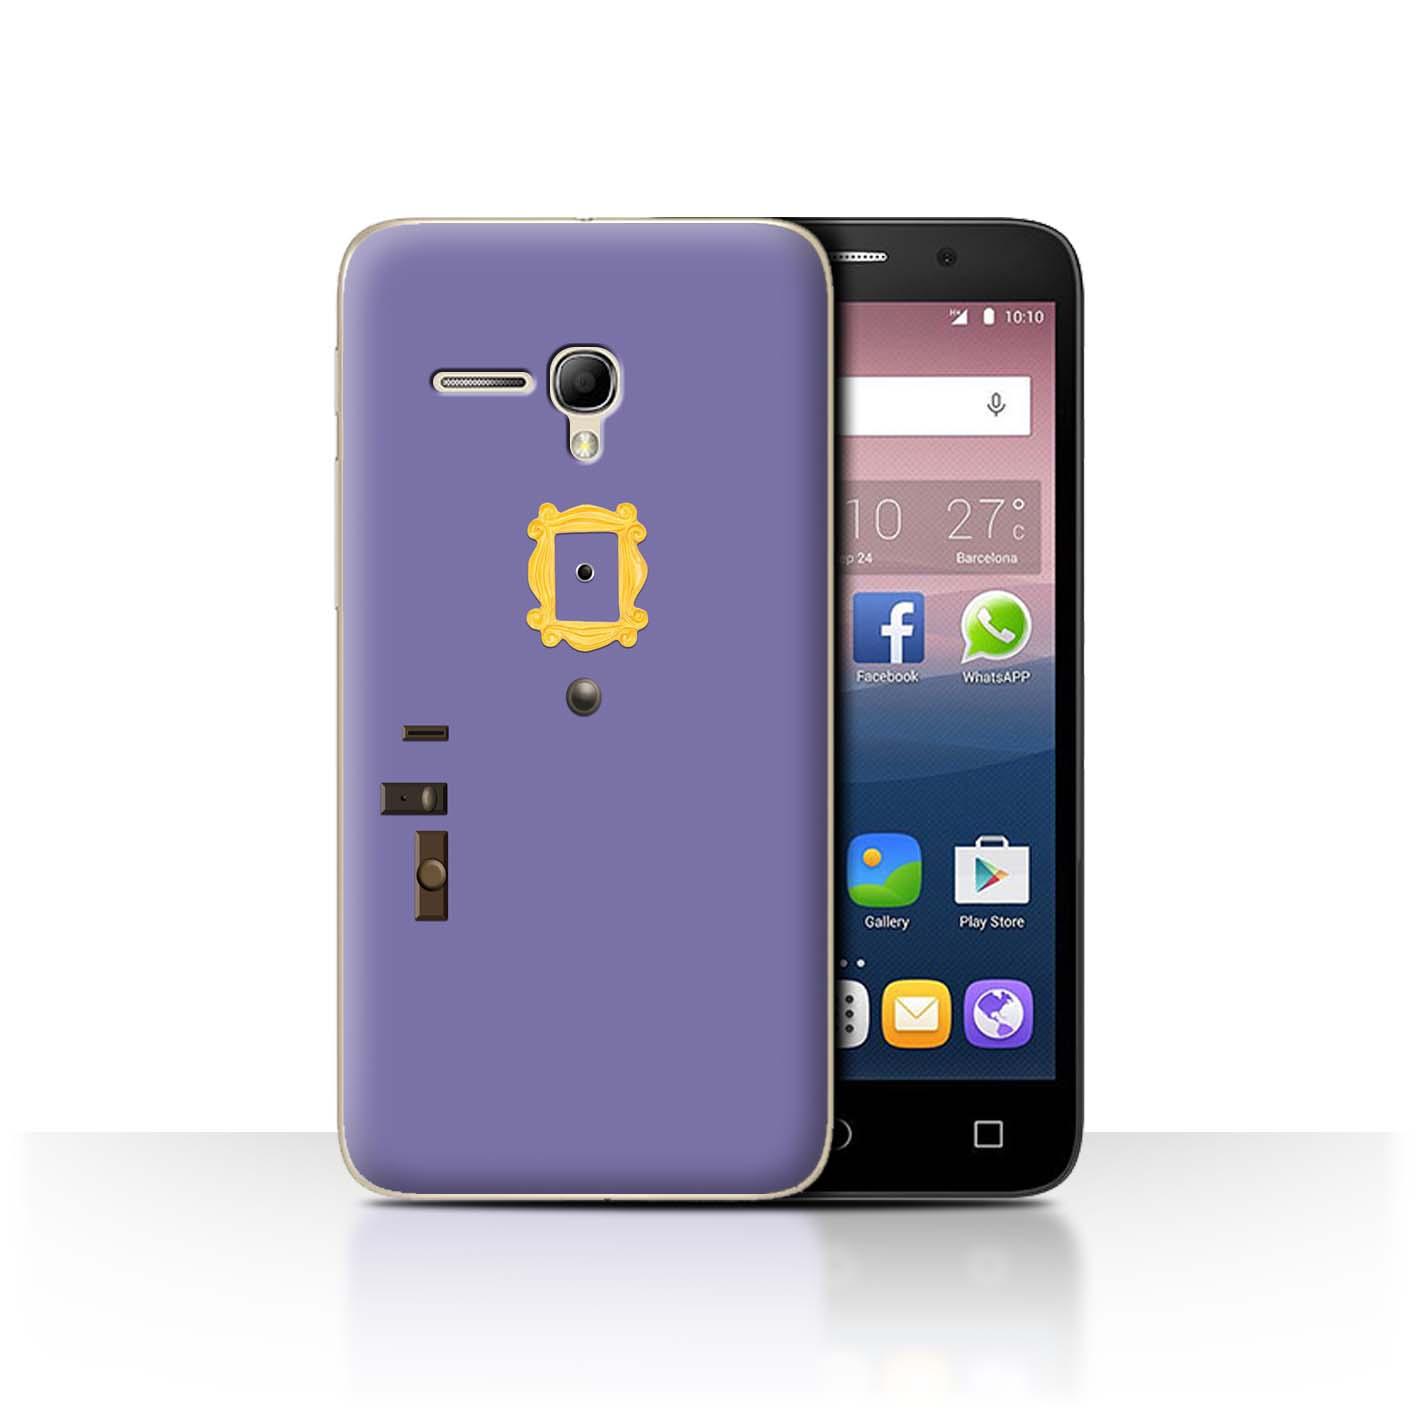 STUFF4-Phone-Case-Back-Cover-for-Alcatel-Pop-3-5-5-034-3G-Funny-Sitcom-TV-Parody